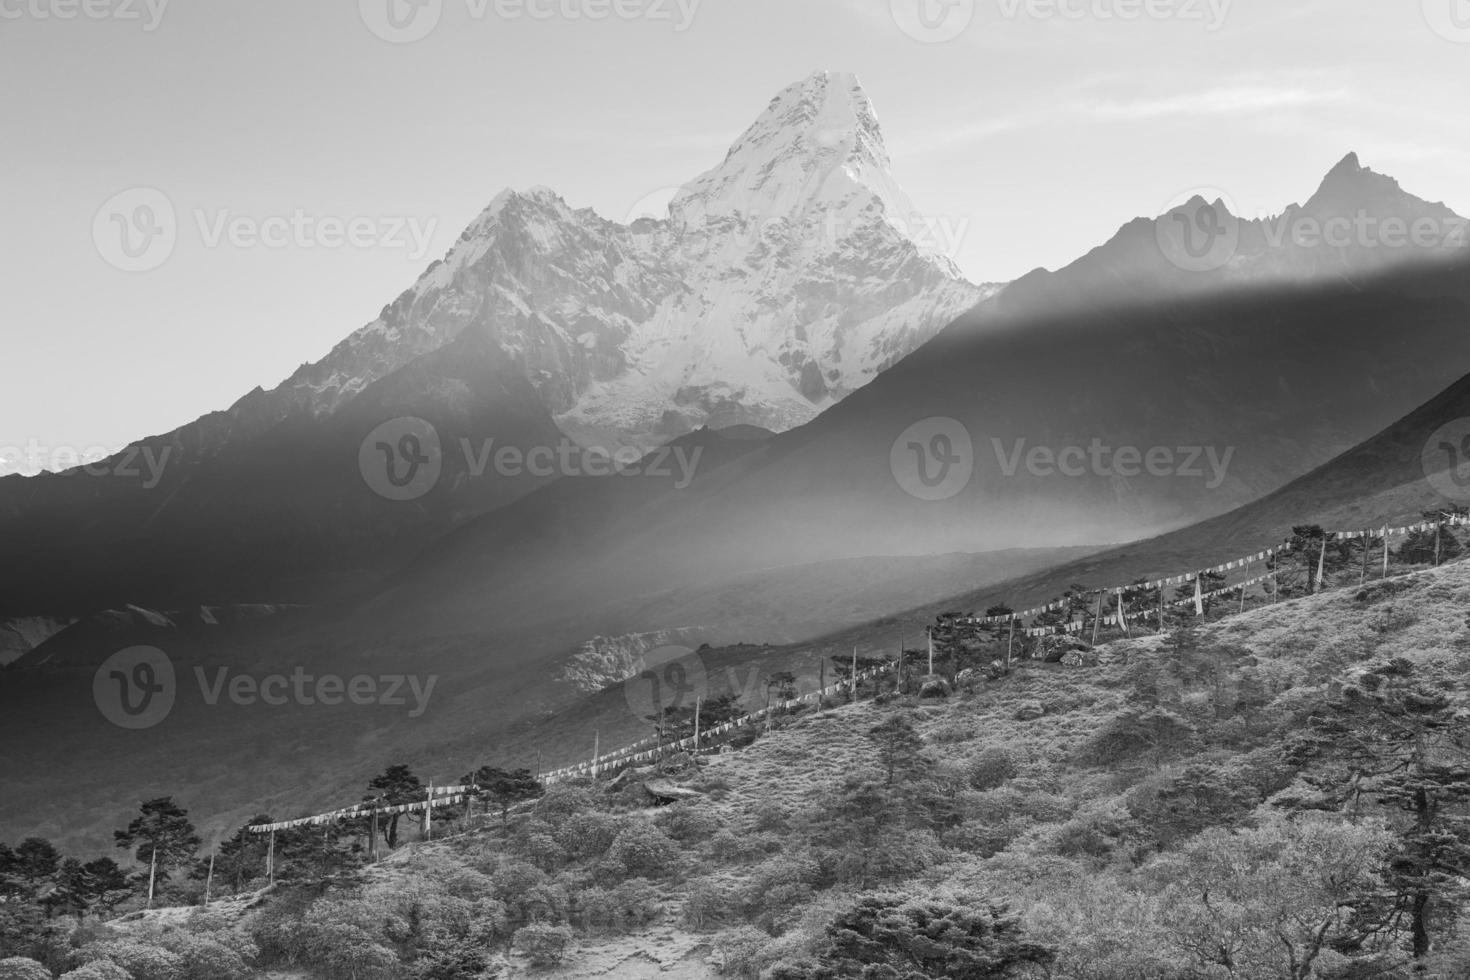 b & w ama dablam bergtoppen ochtendmist, tengboche dorp, nepal. foto